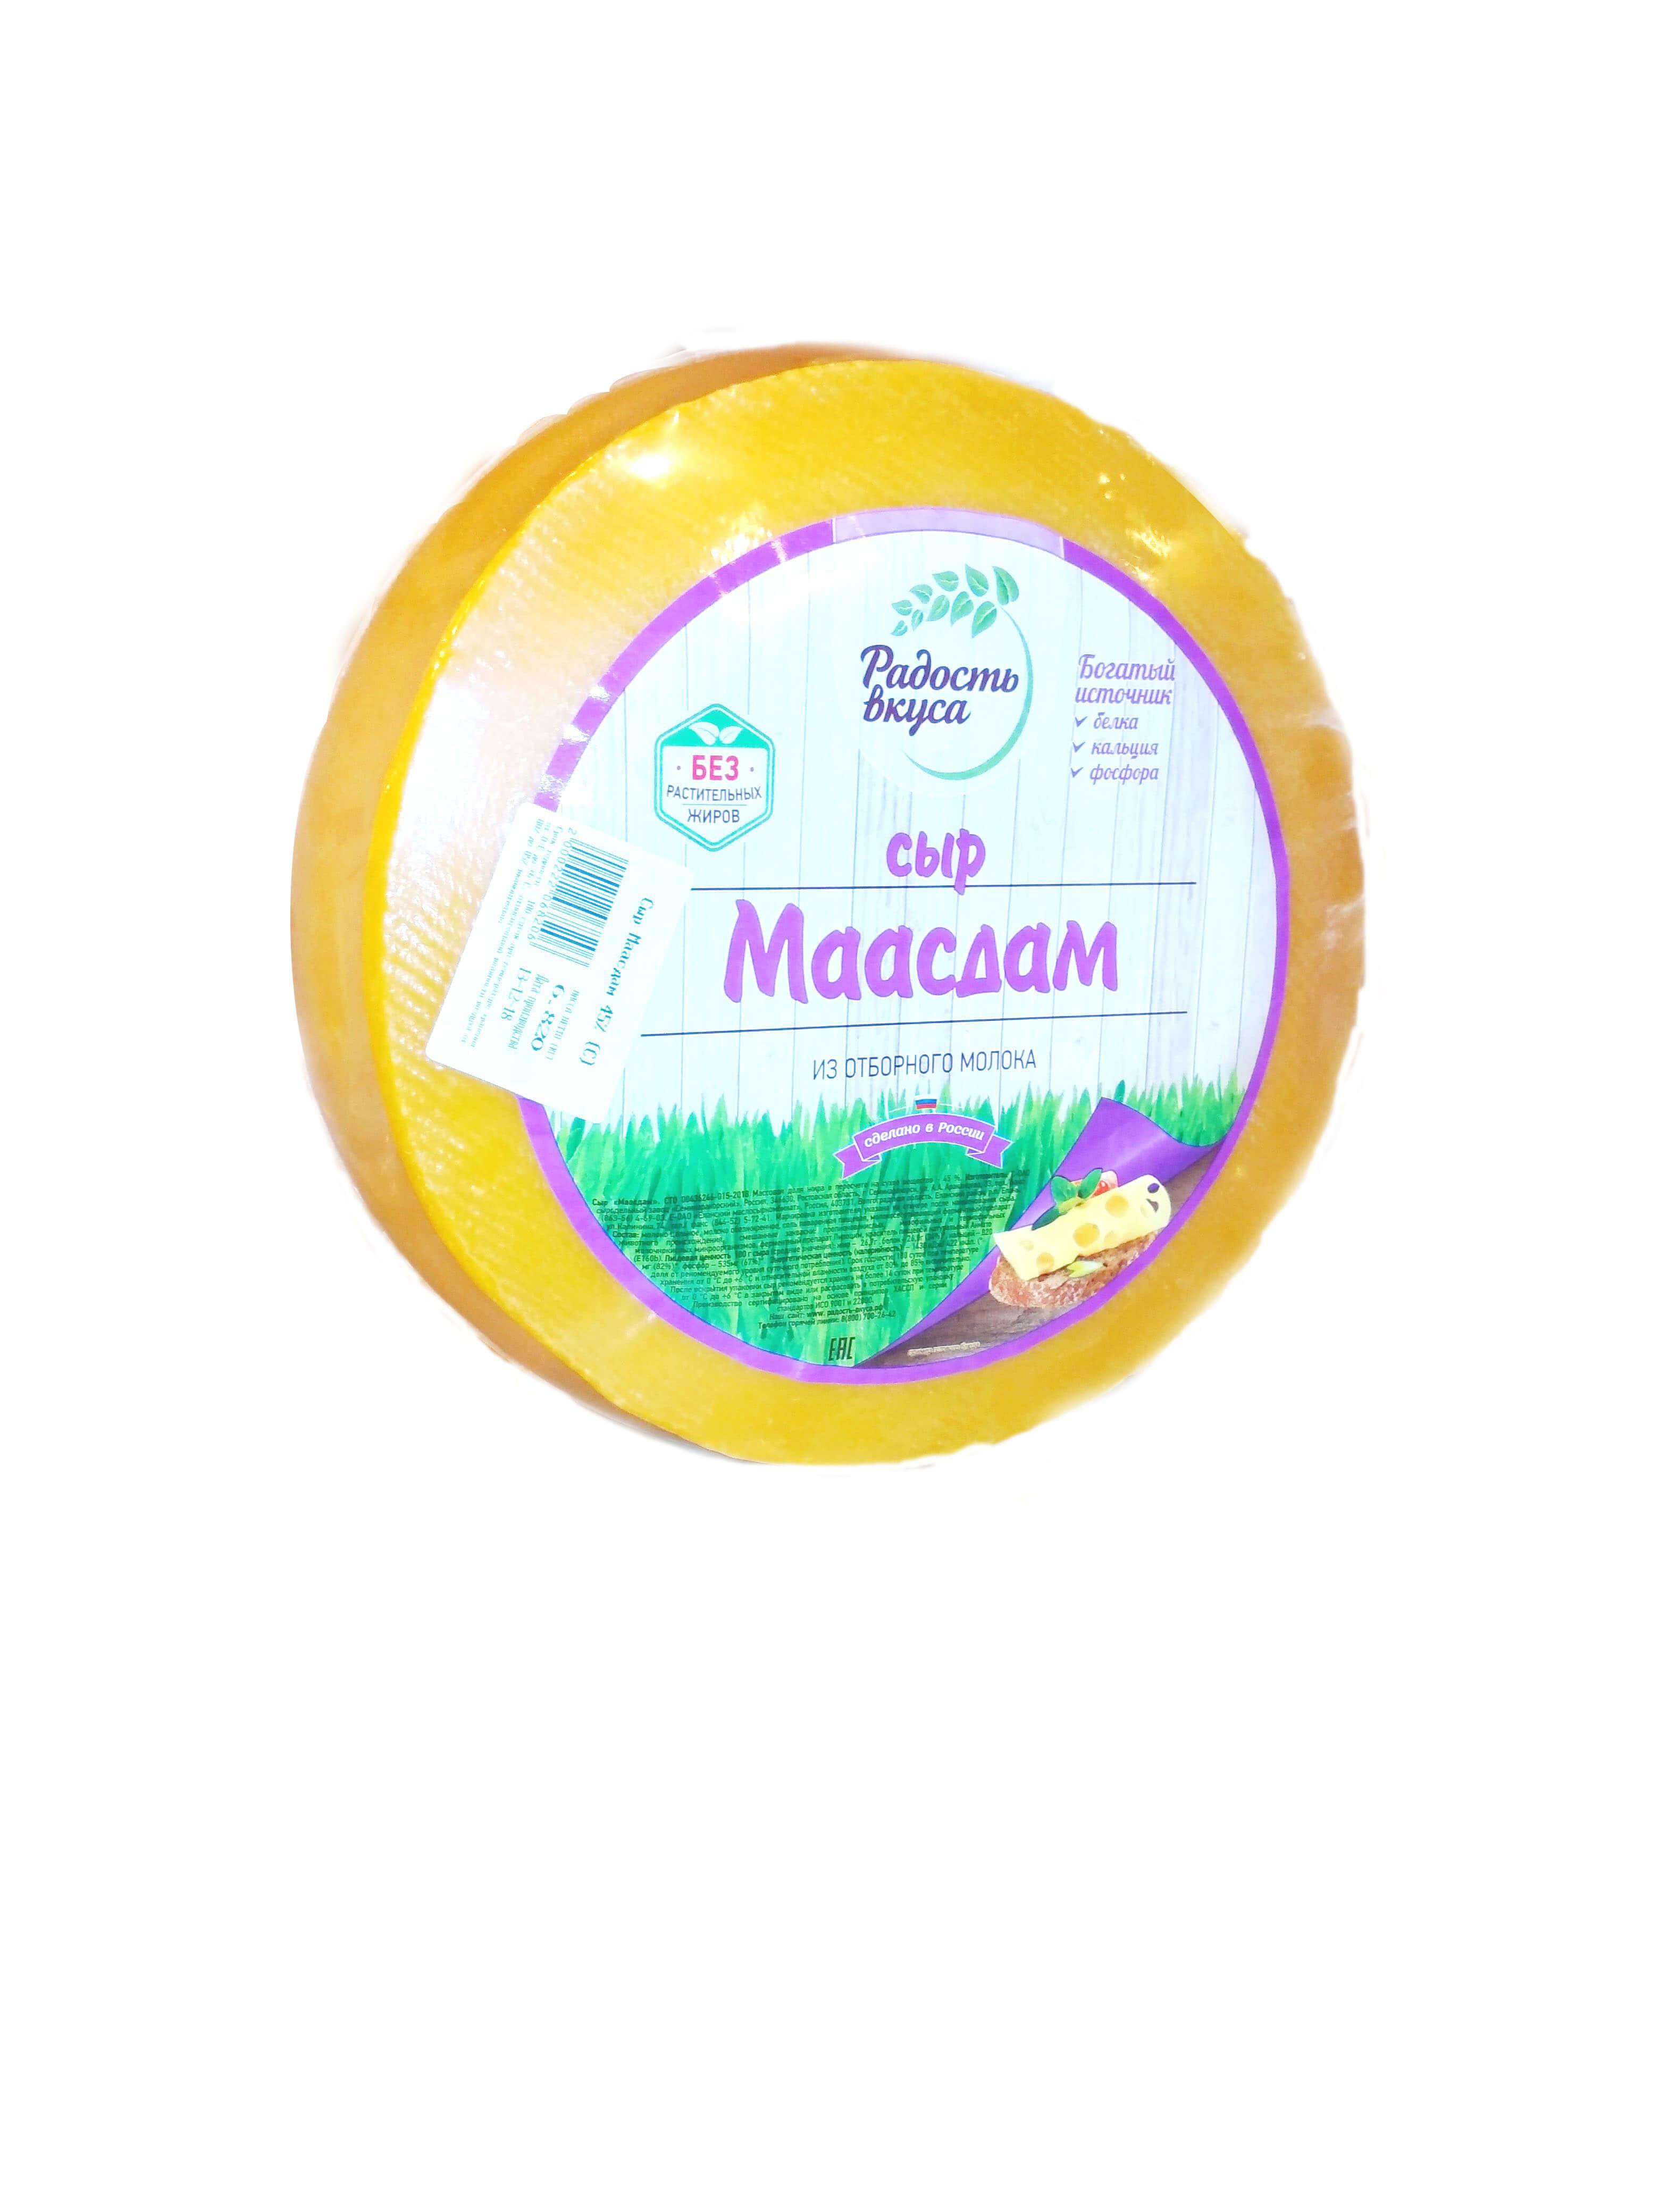 Маасдам (Радость вкуса) круг